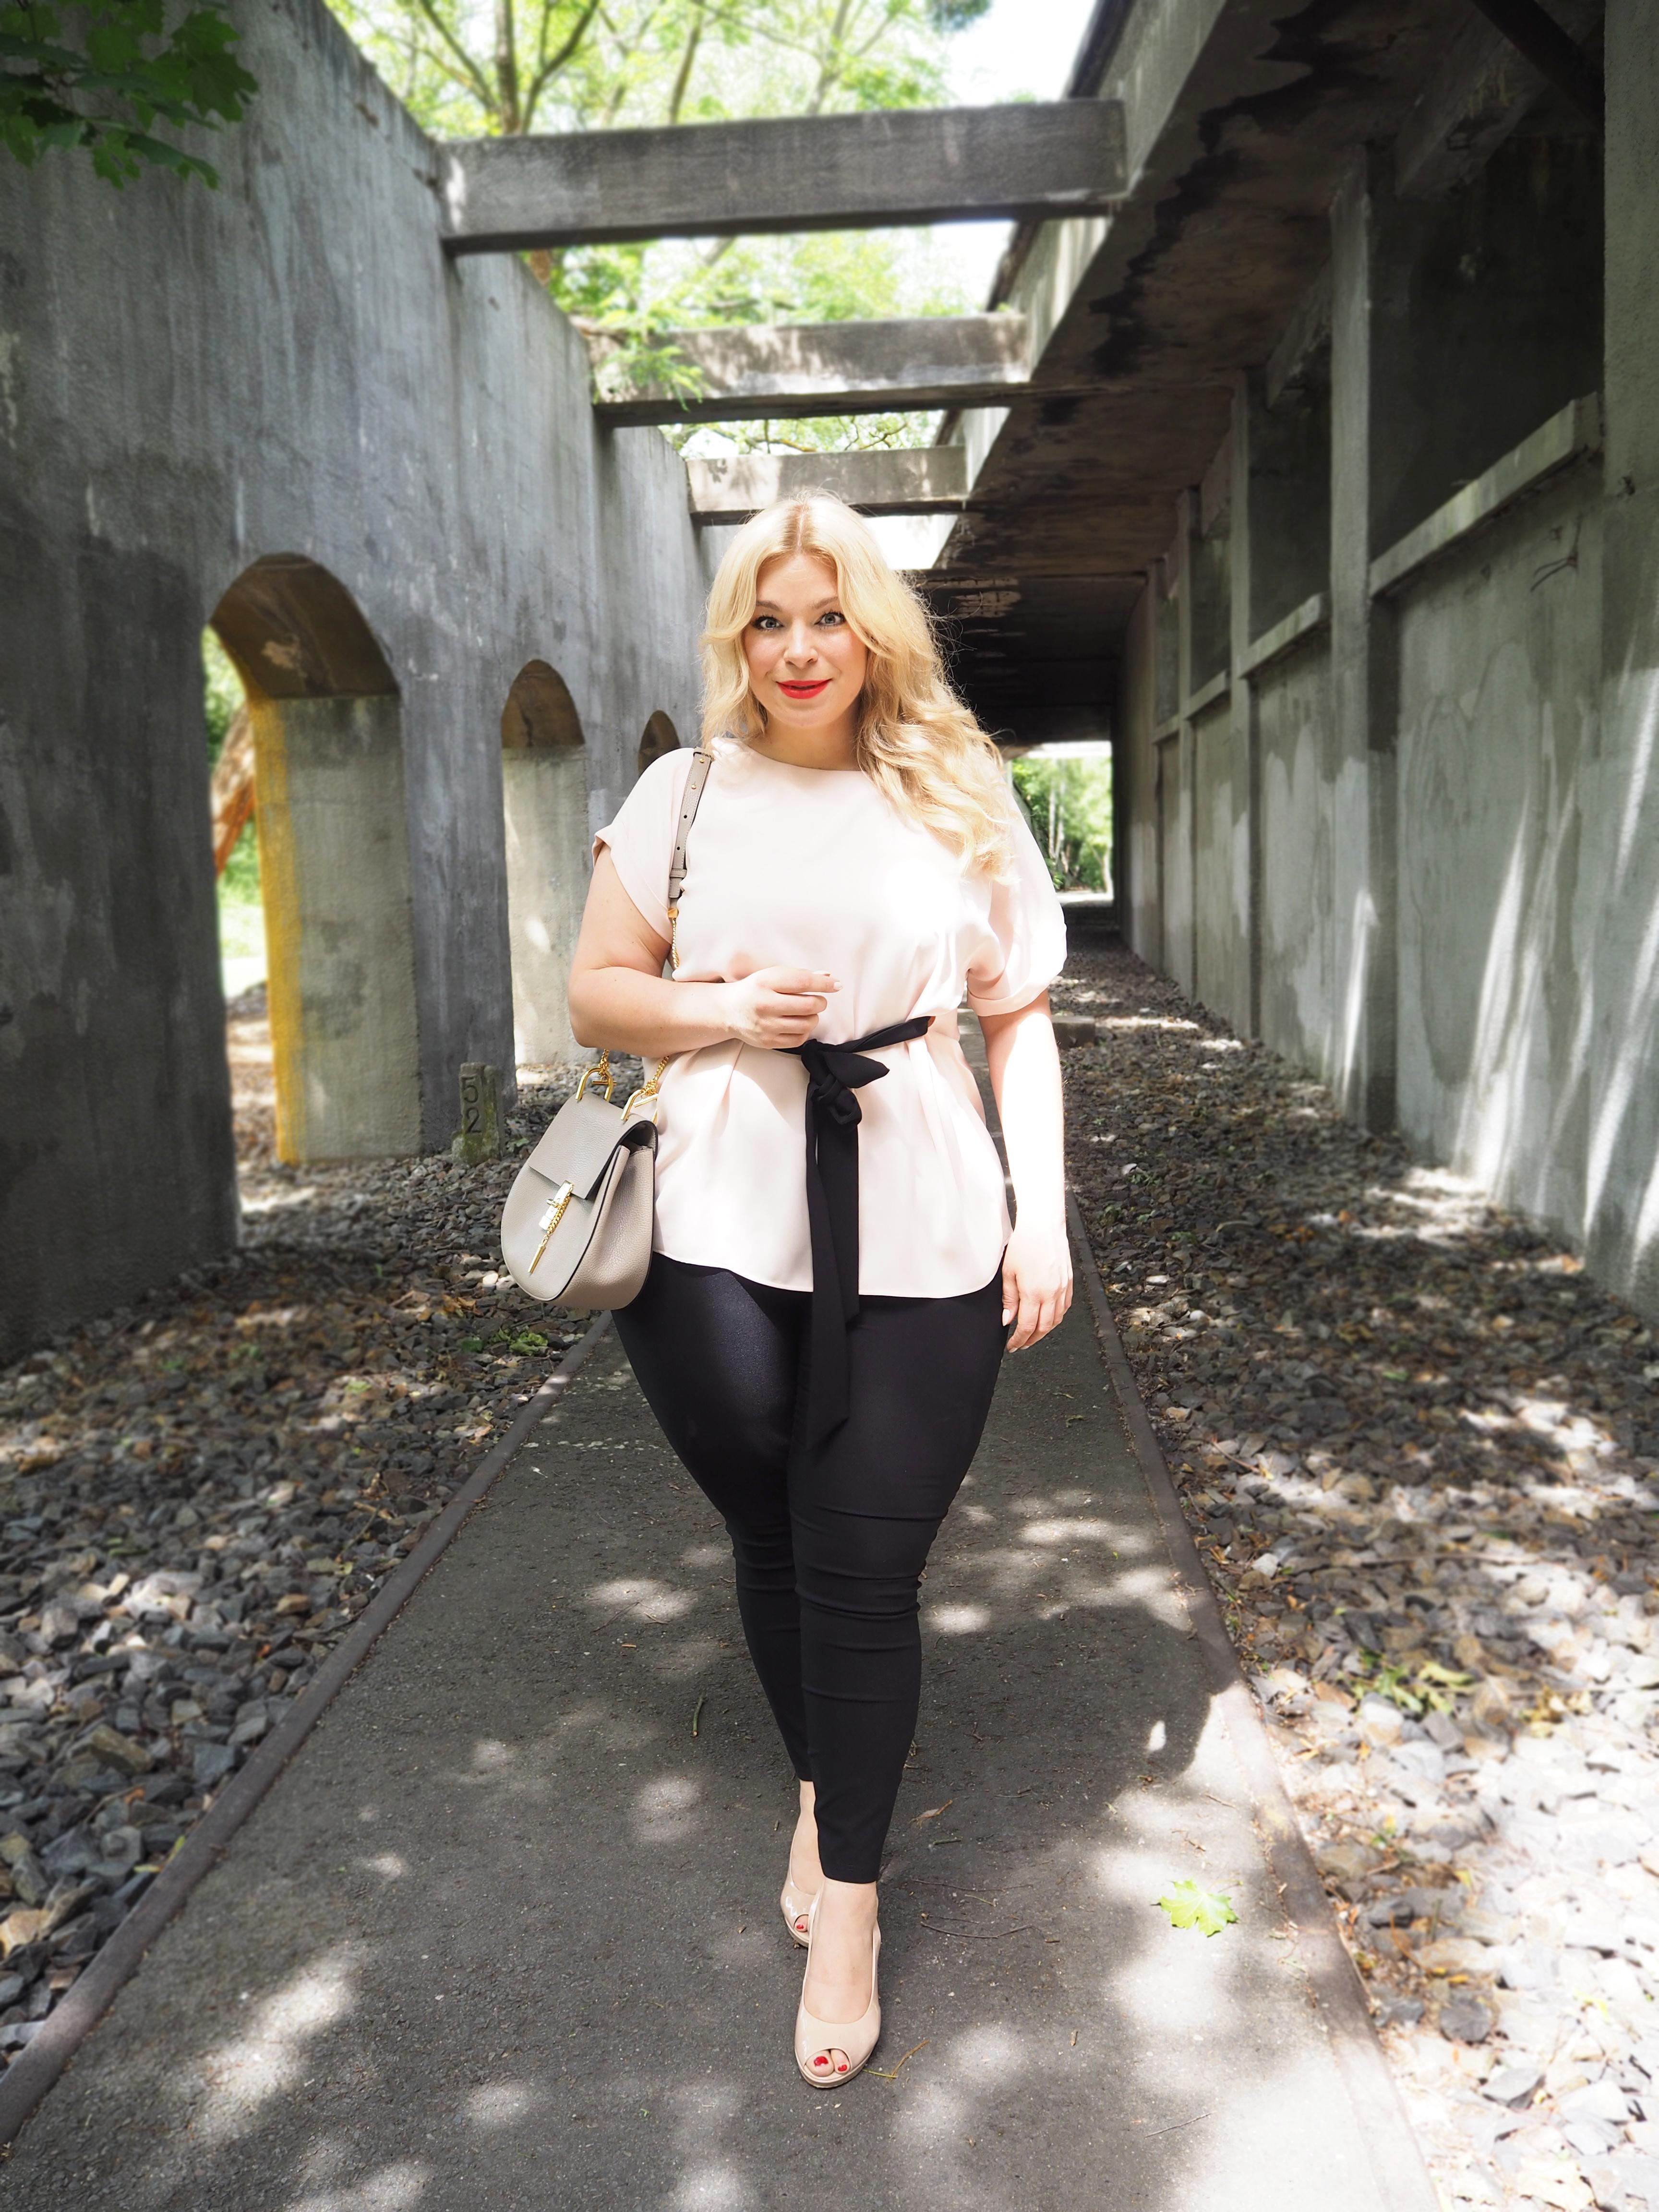 Caterina-Sallie-Sahne-Pogorzelski-megabambi-Plusisze-blogger